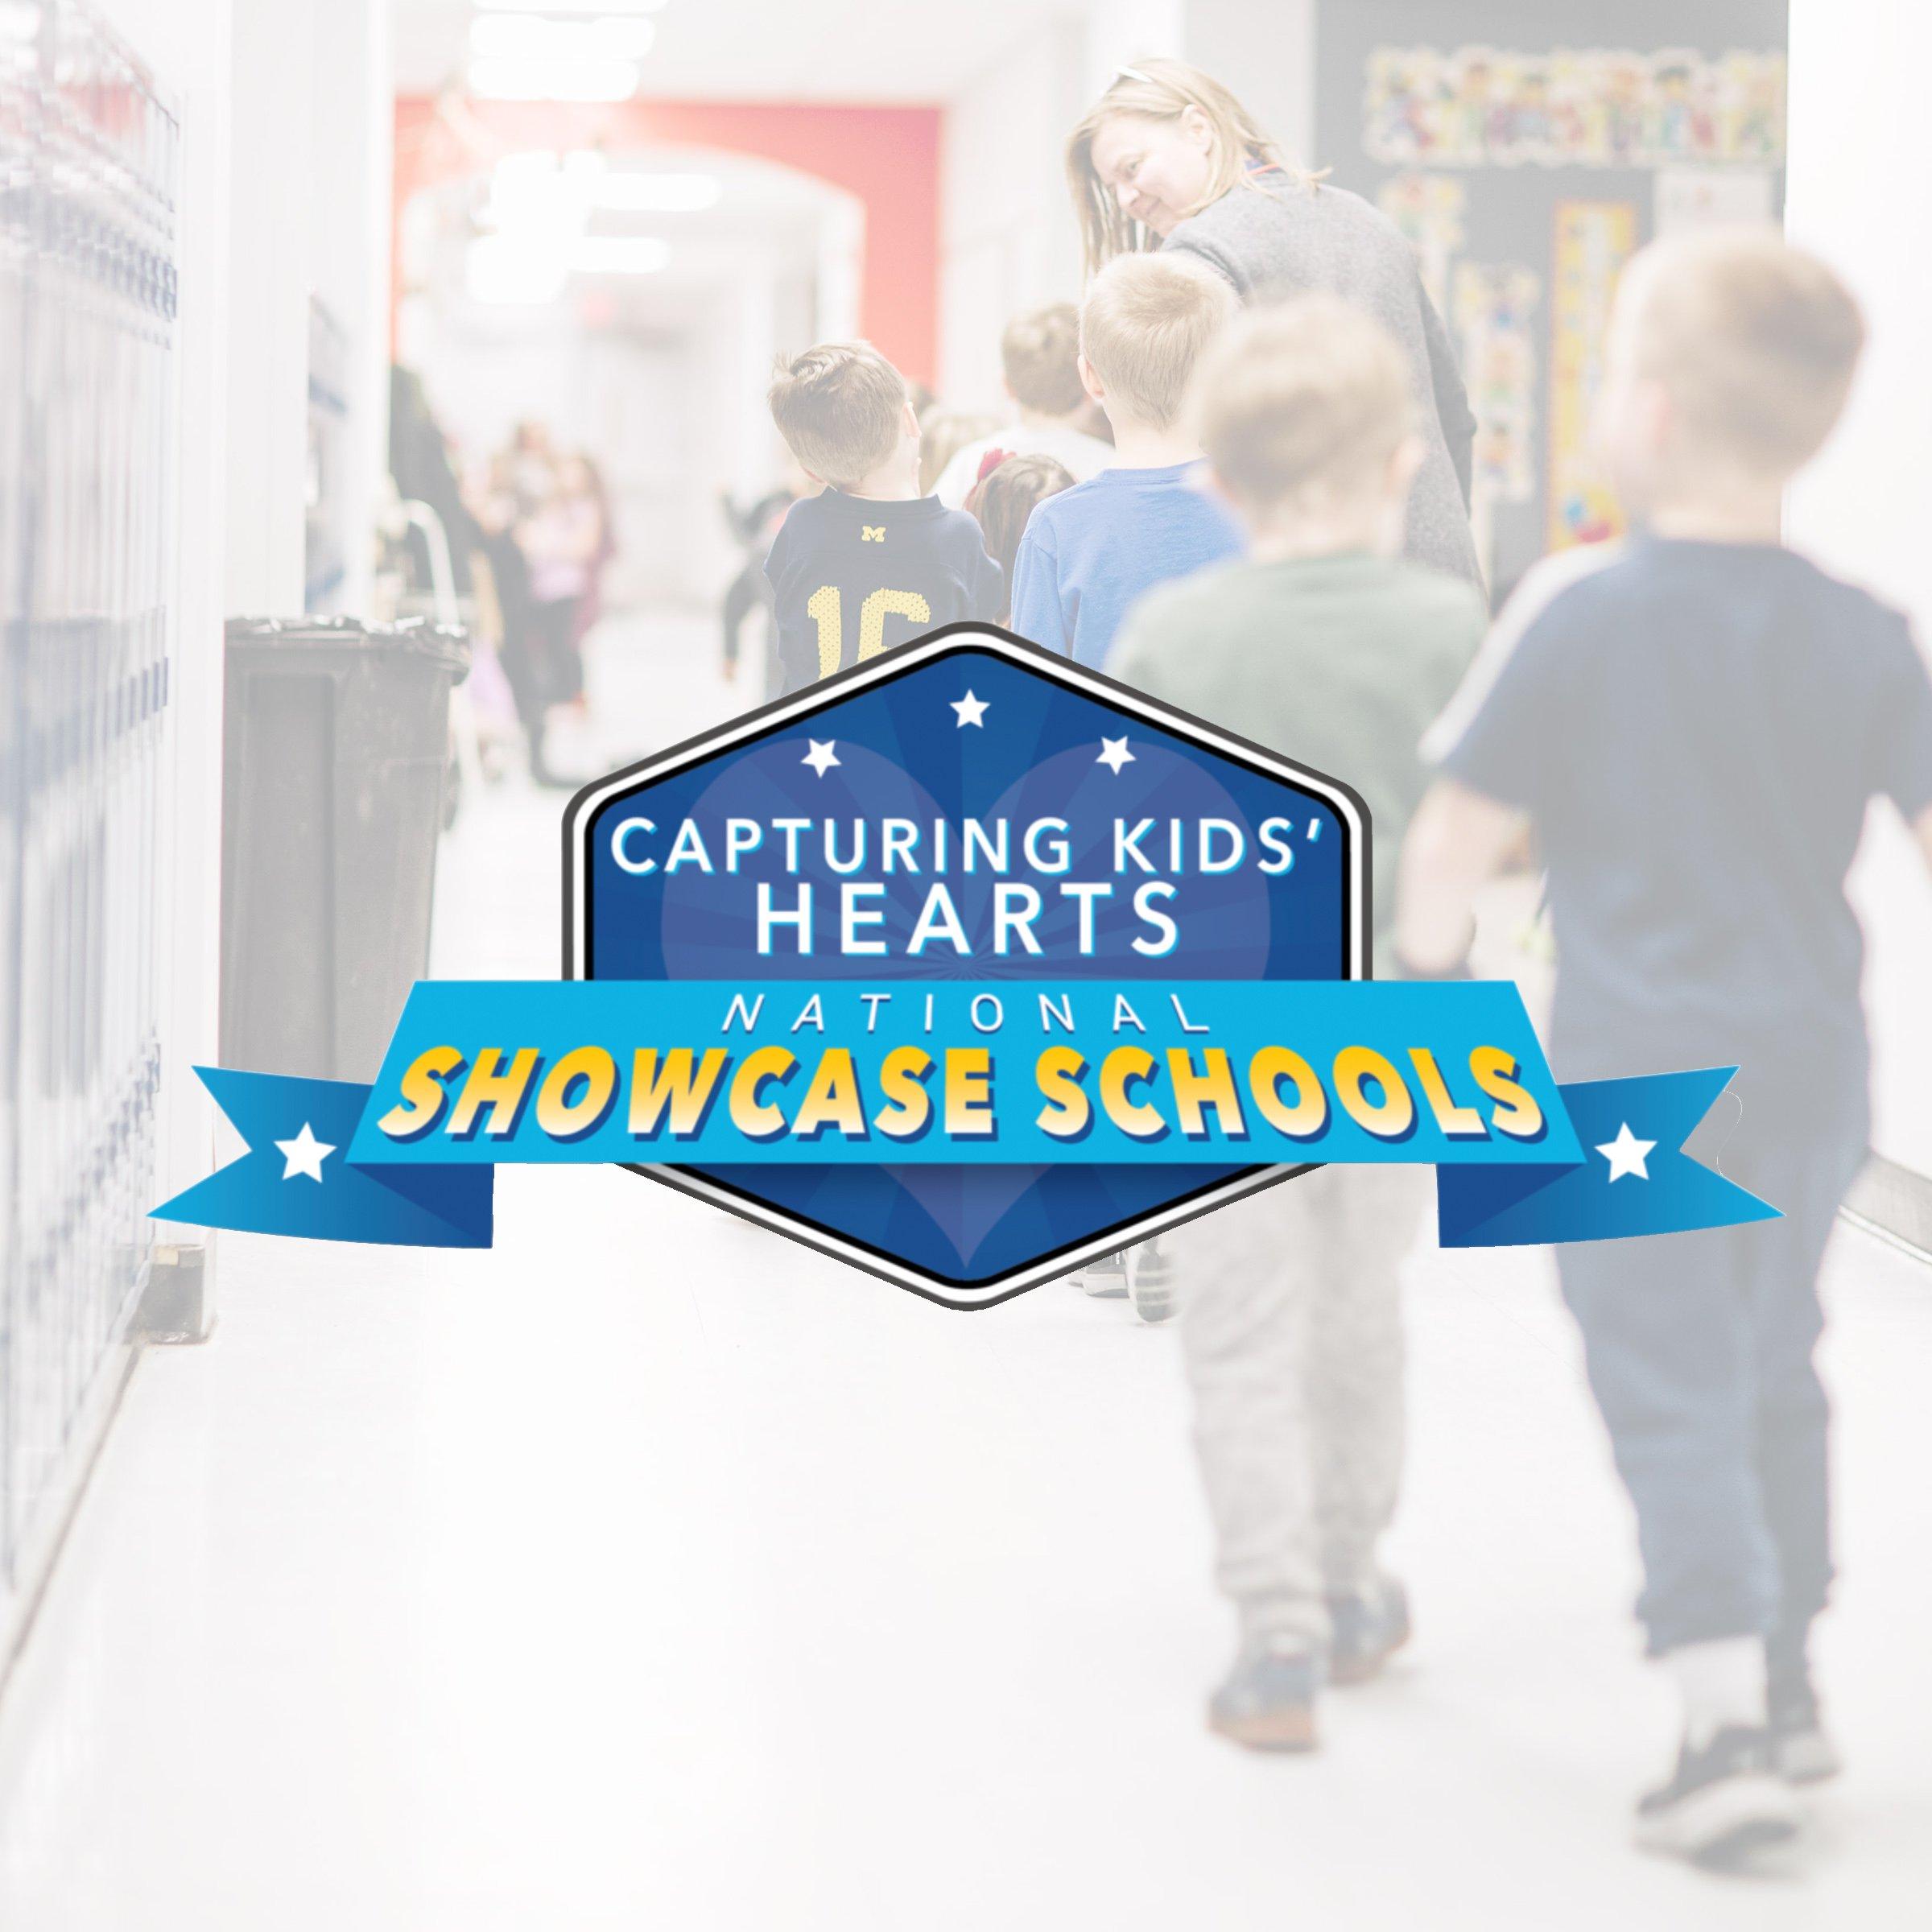 Nationall Showcase School